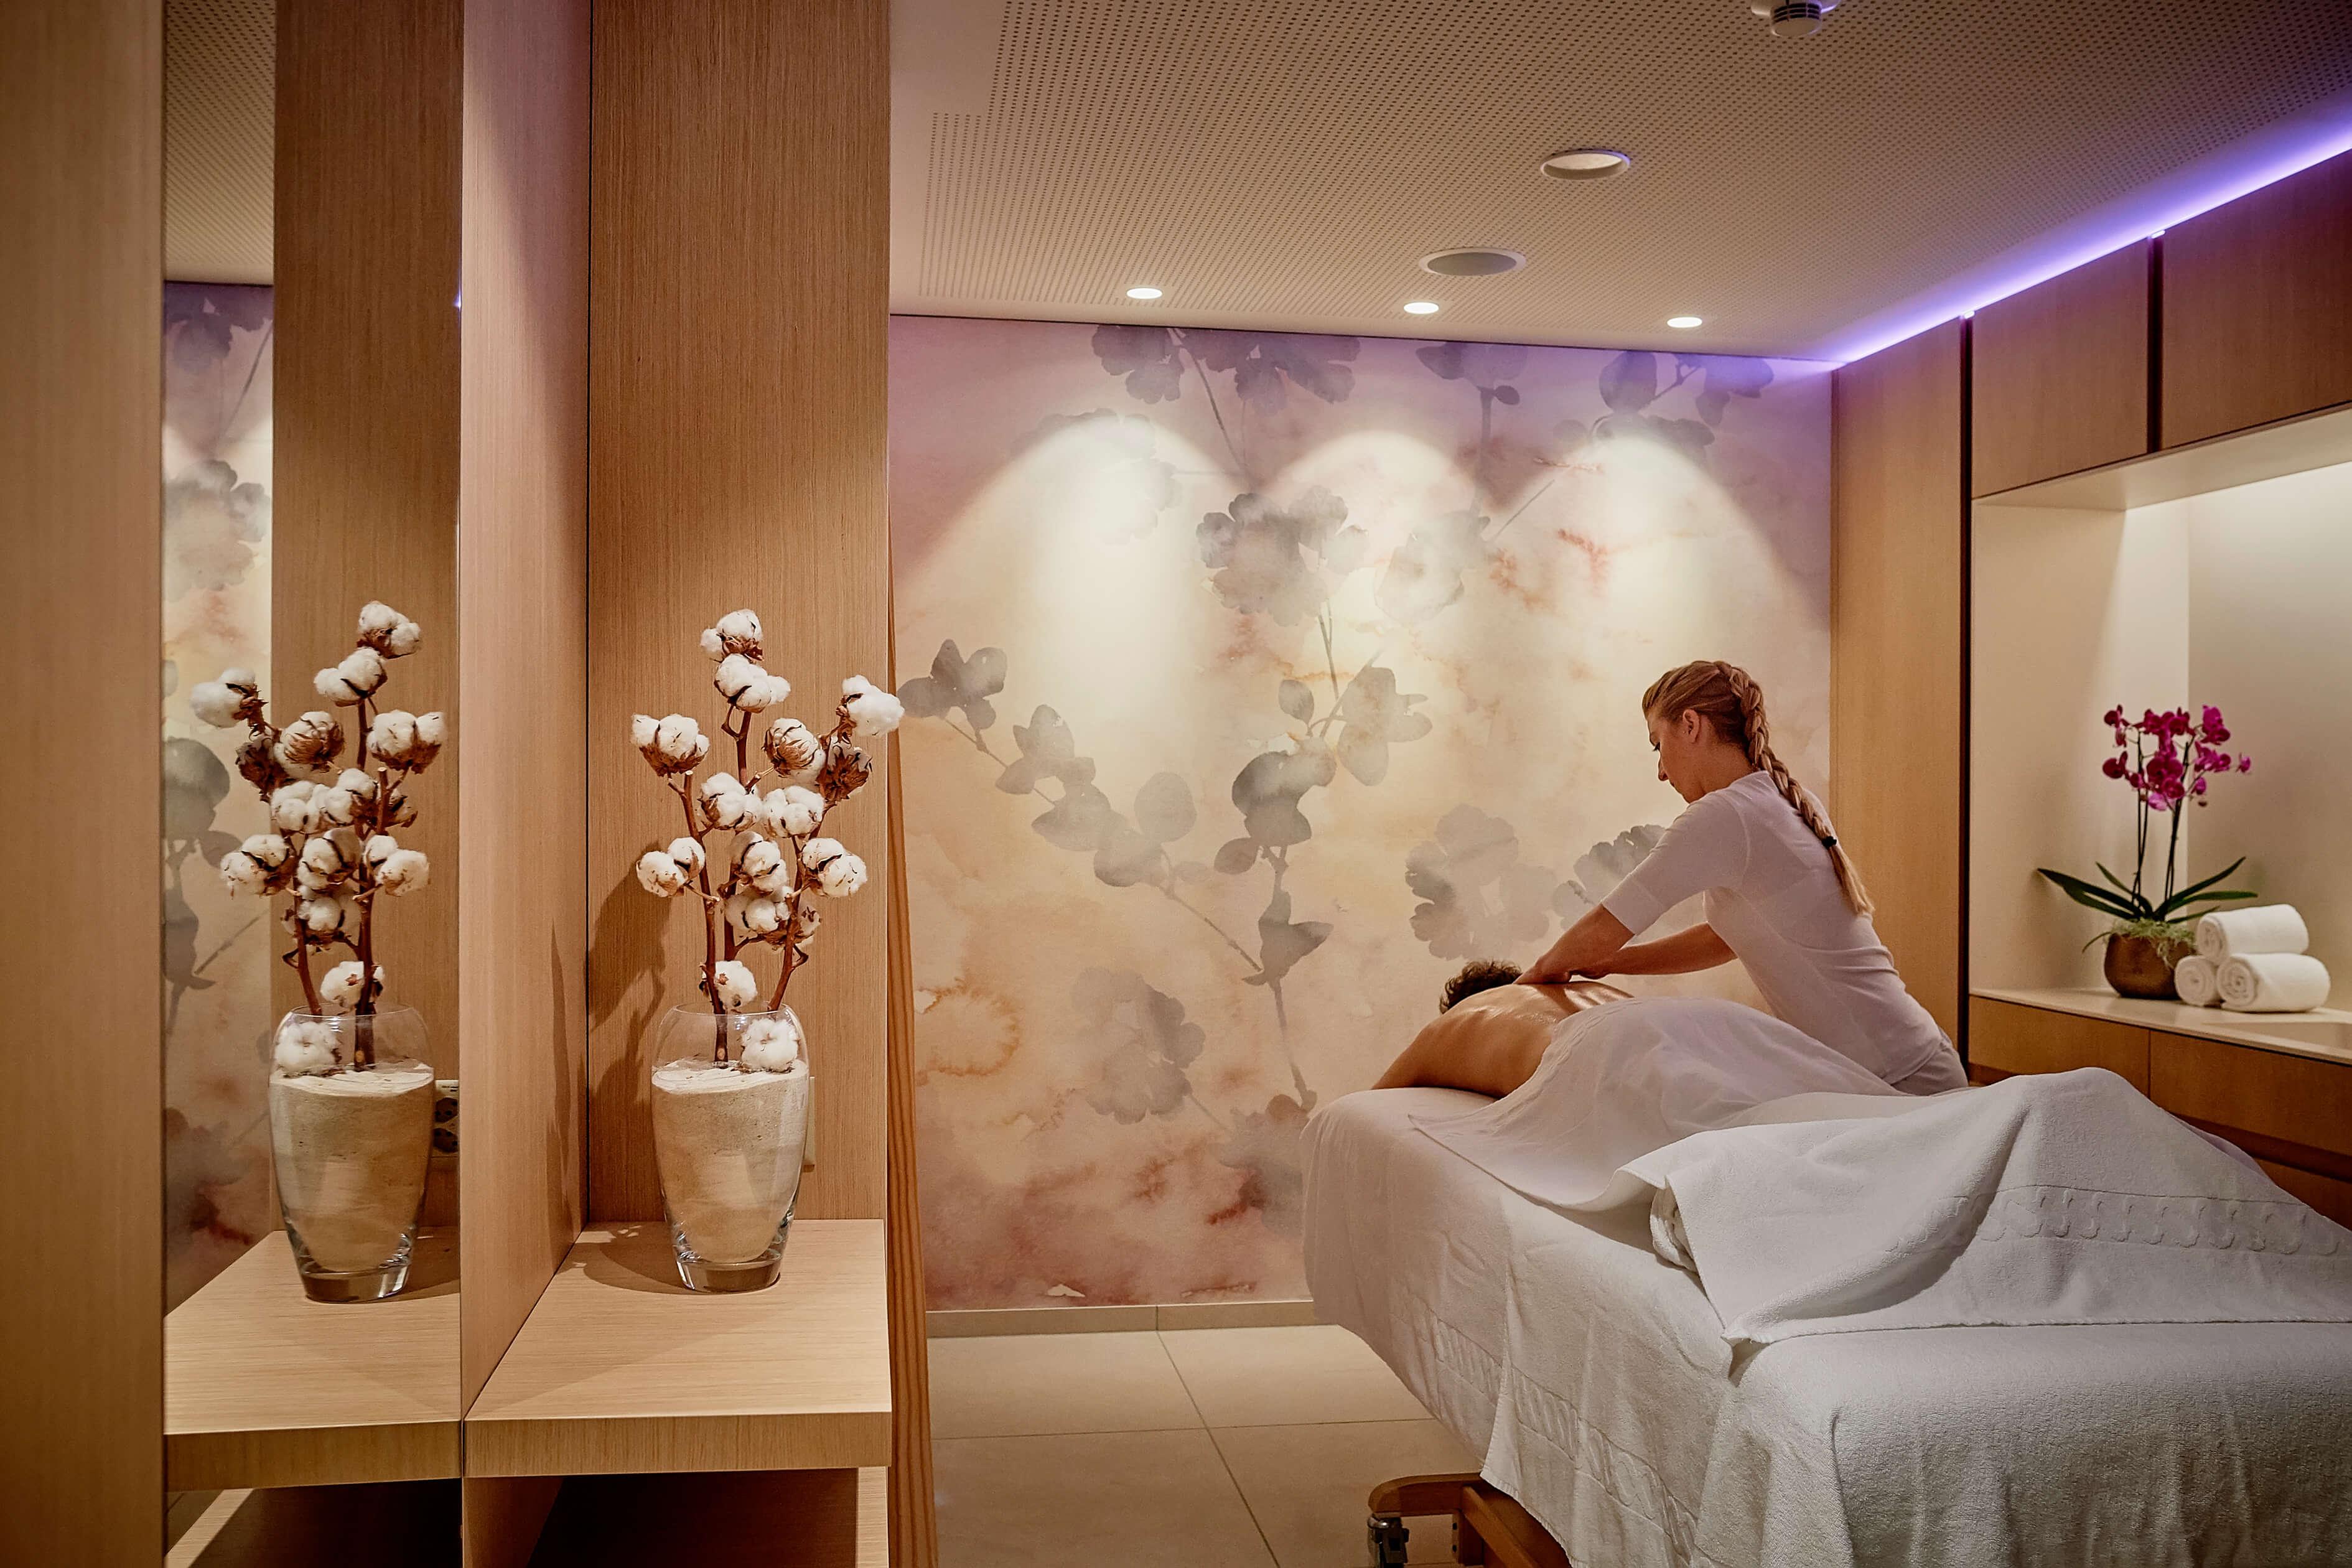 hotel-eden-wellness-massageraum-spiez.jpg